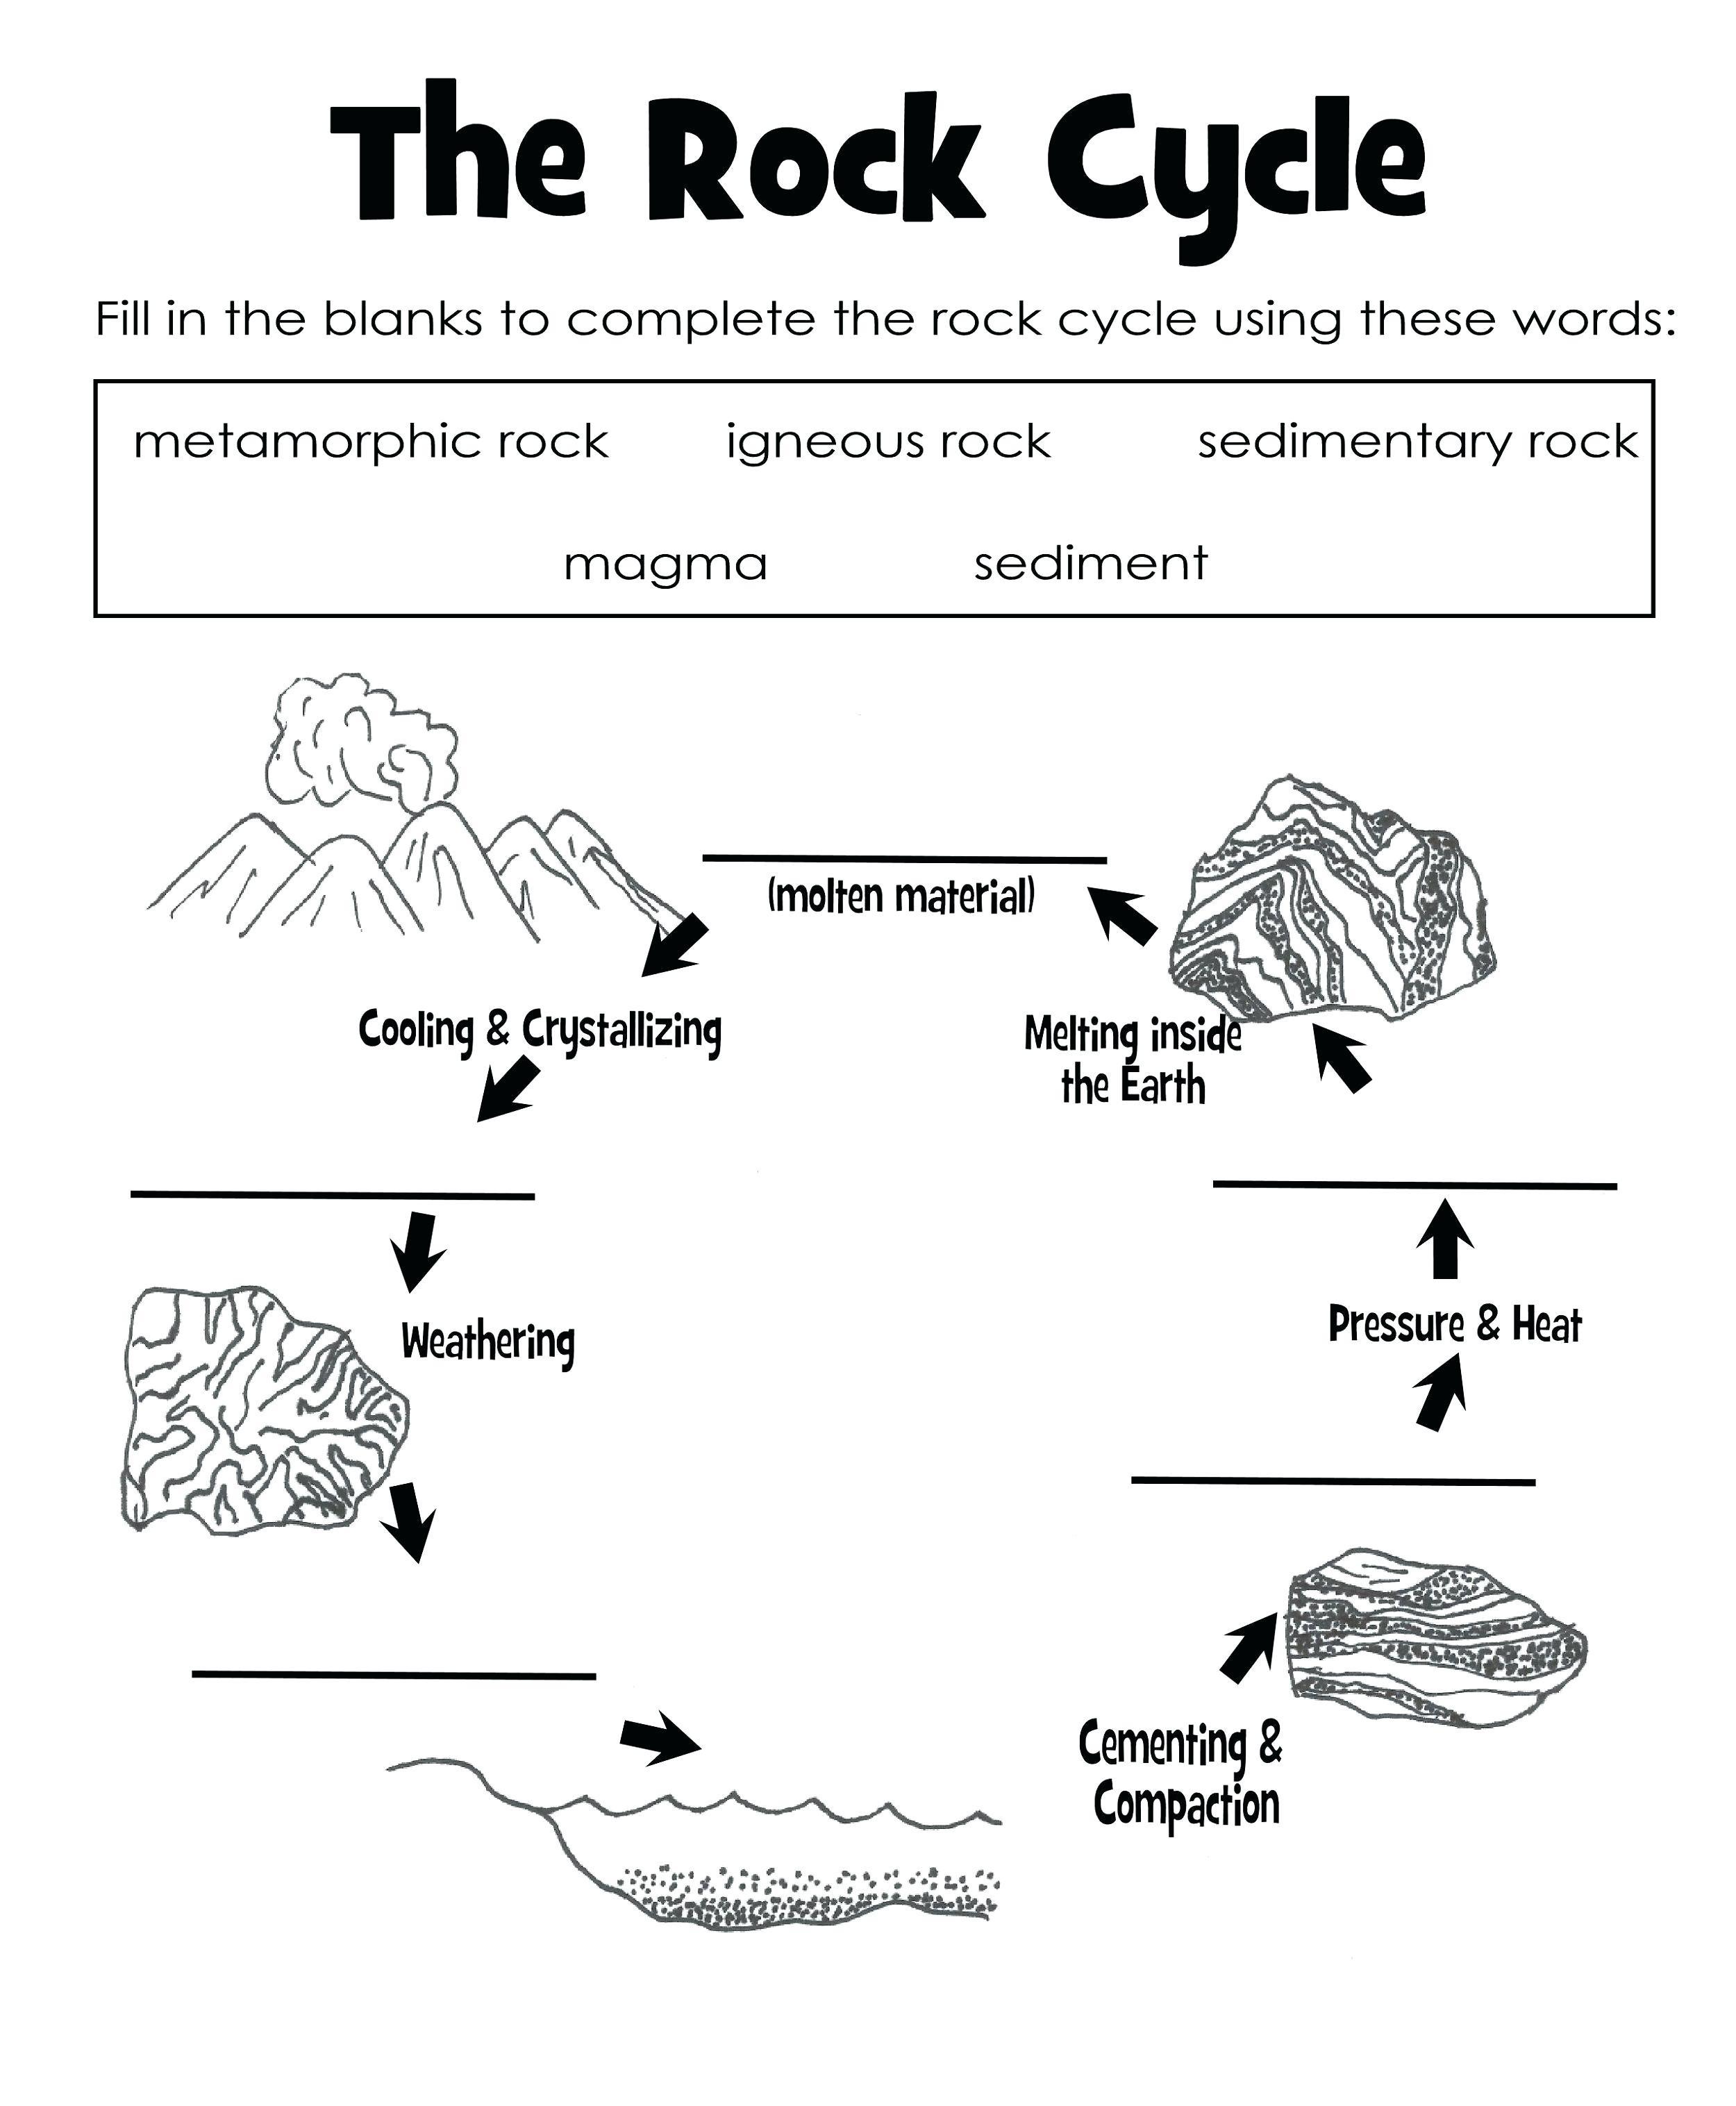 Rock Cycle Worksheet Middle School — db excel.com